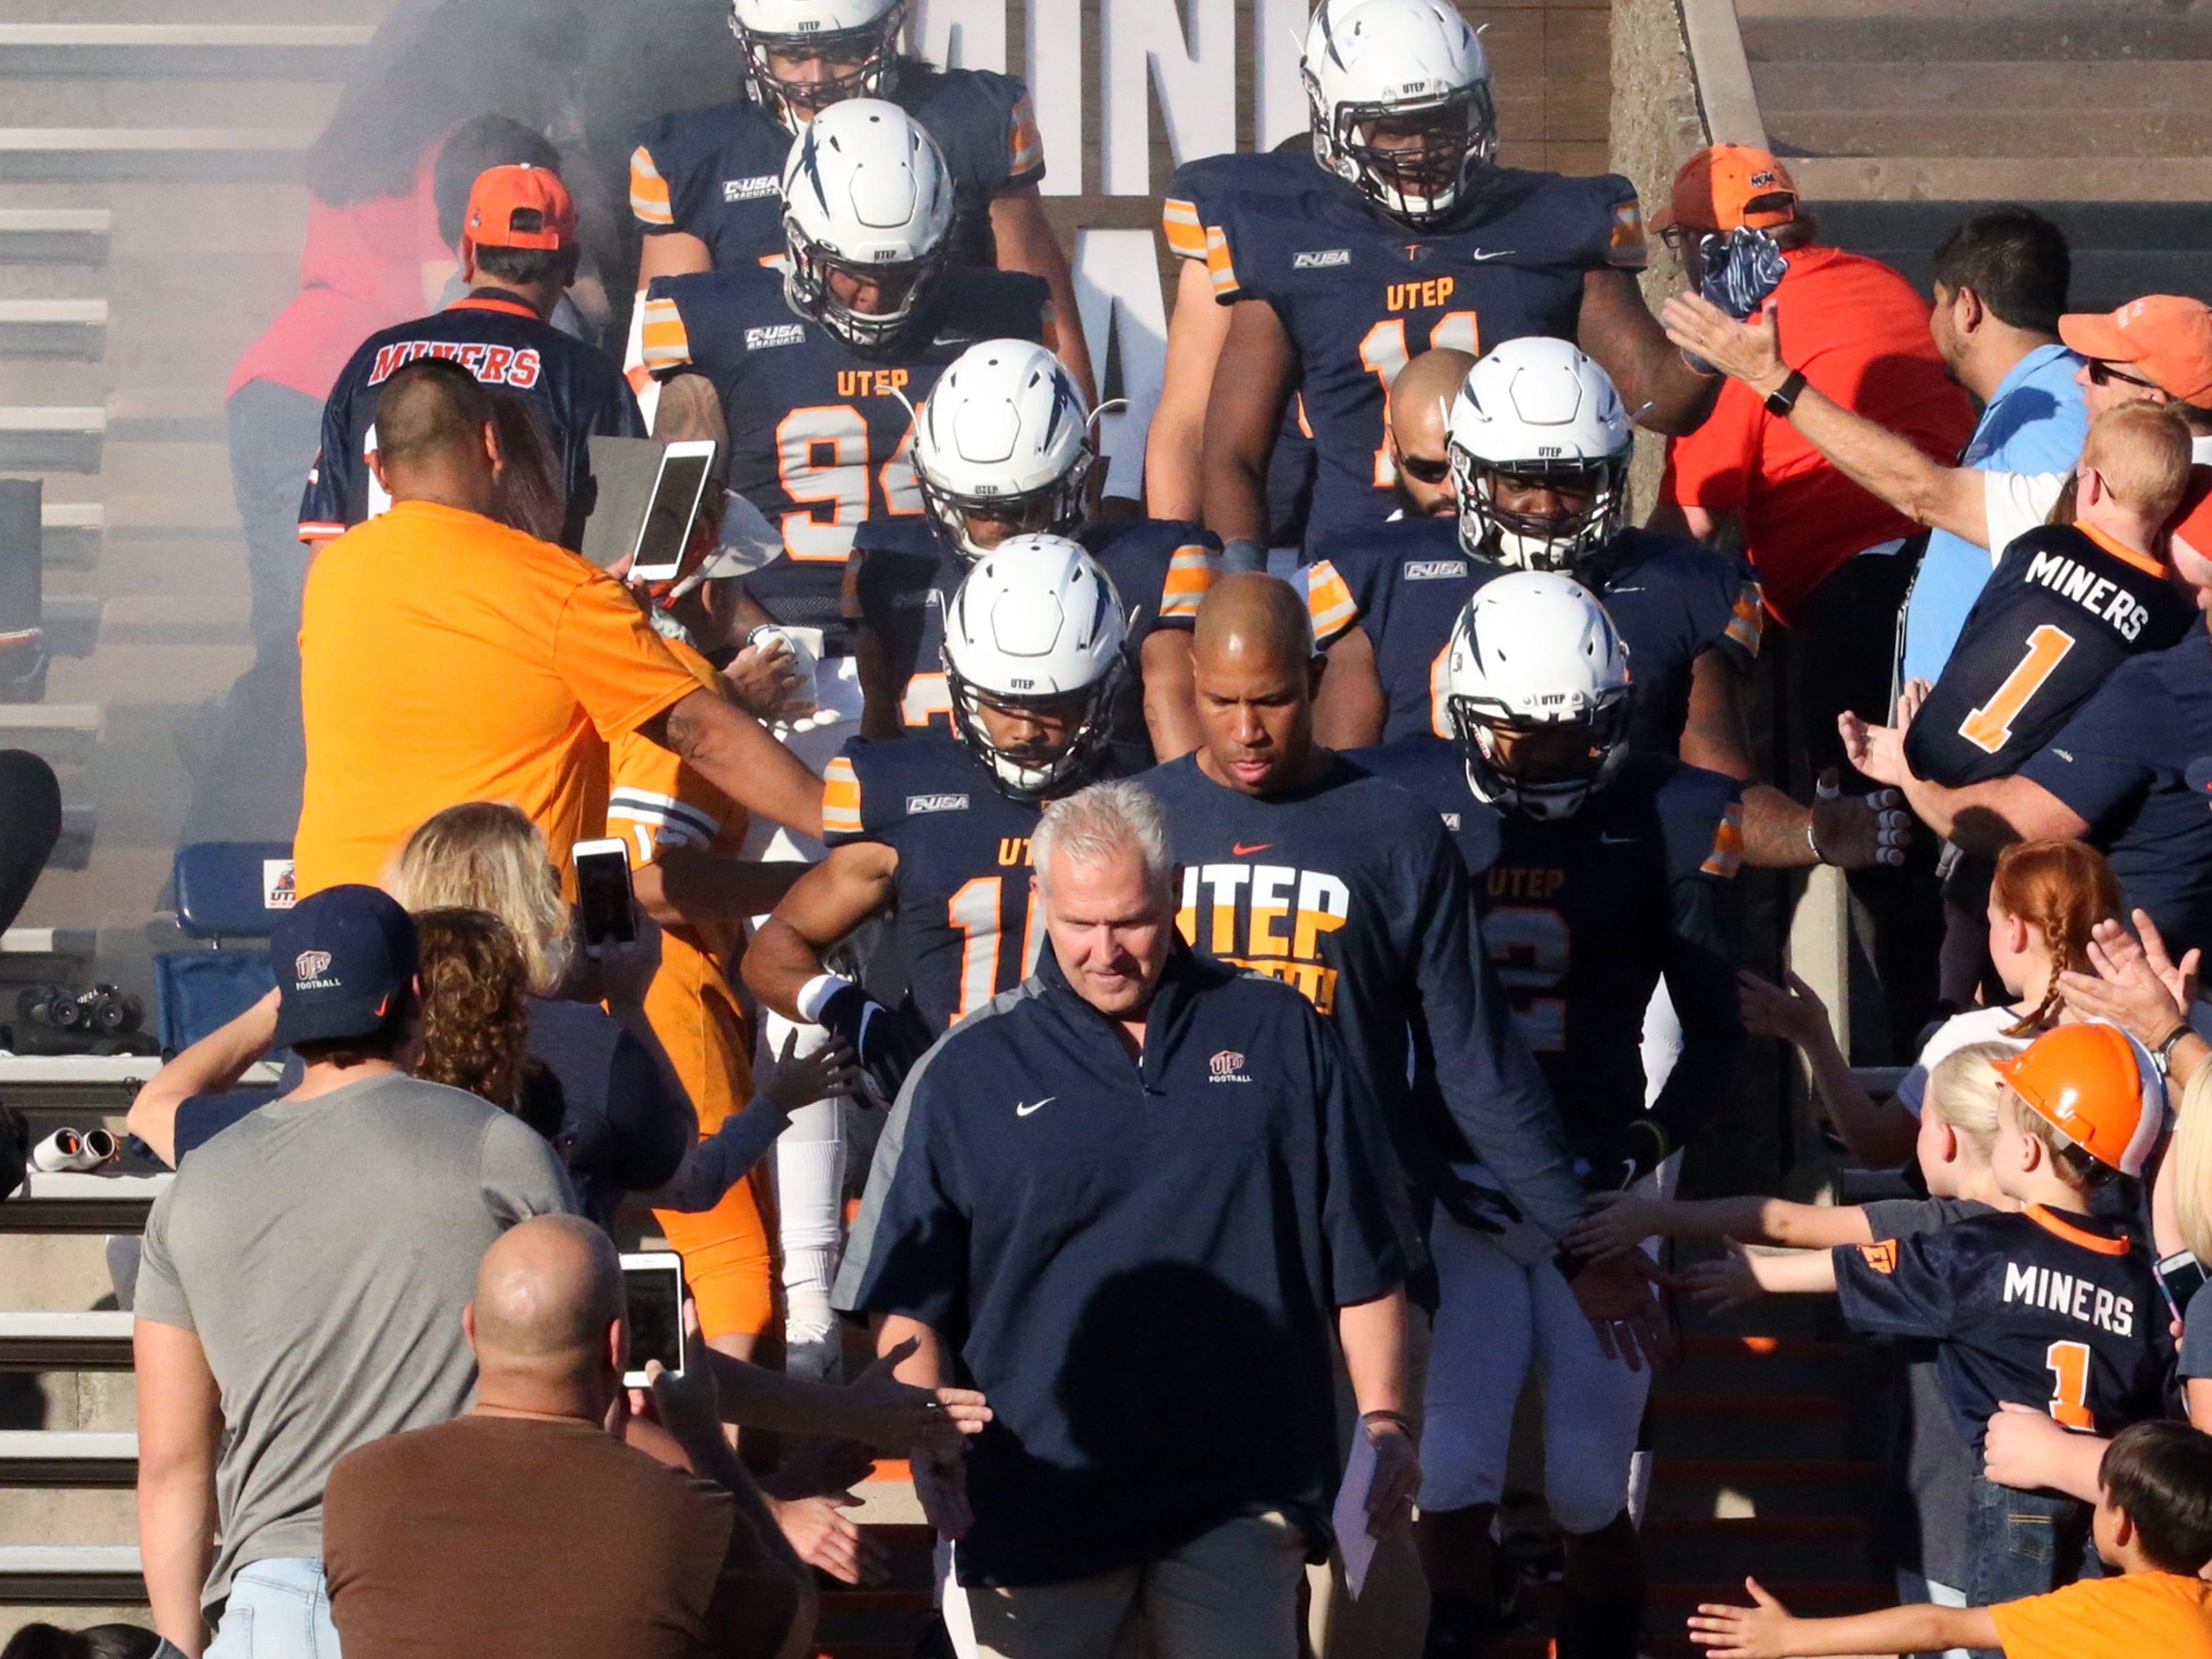 UTEP football team's struggles against Western Kentucky raise questions